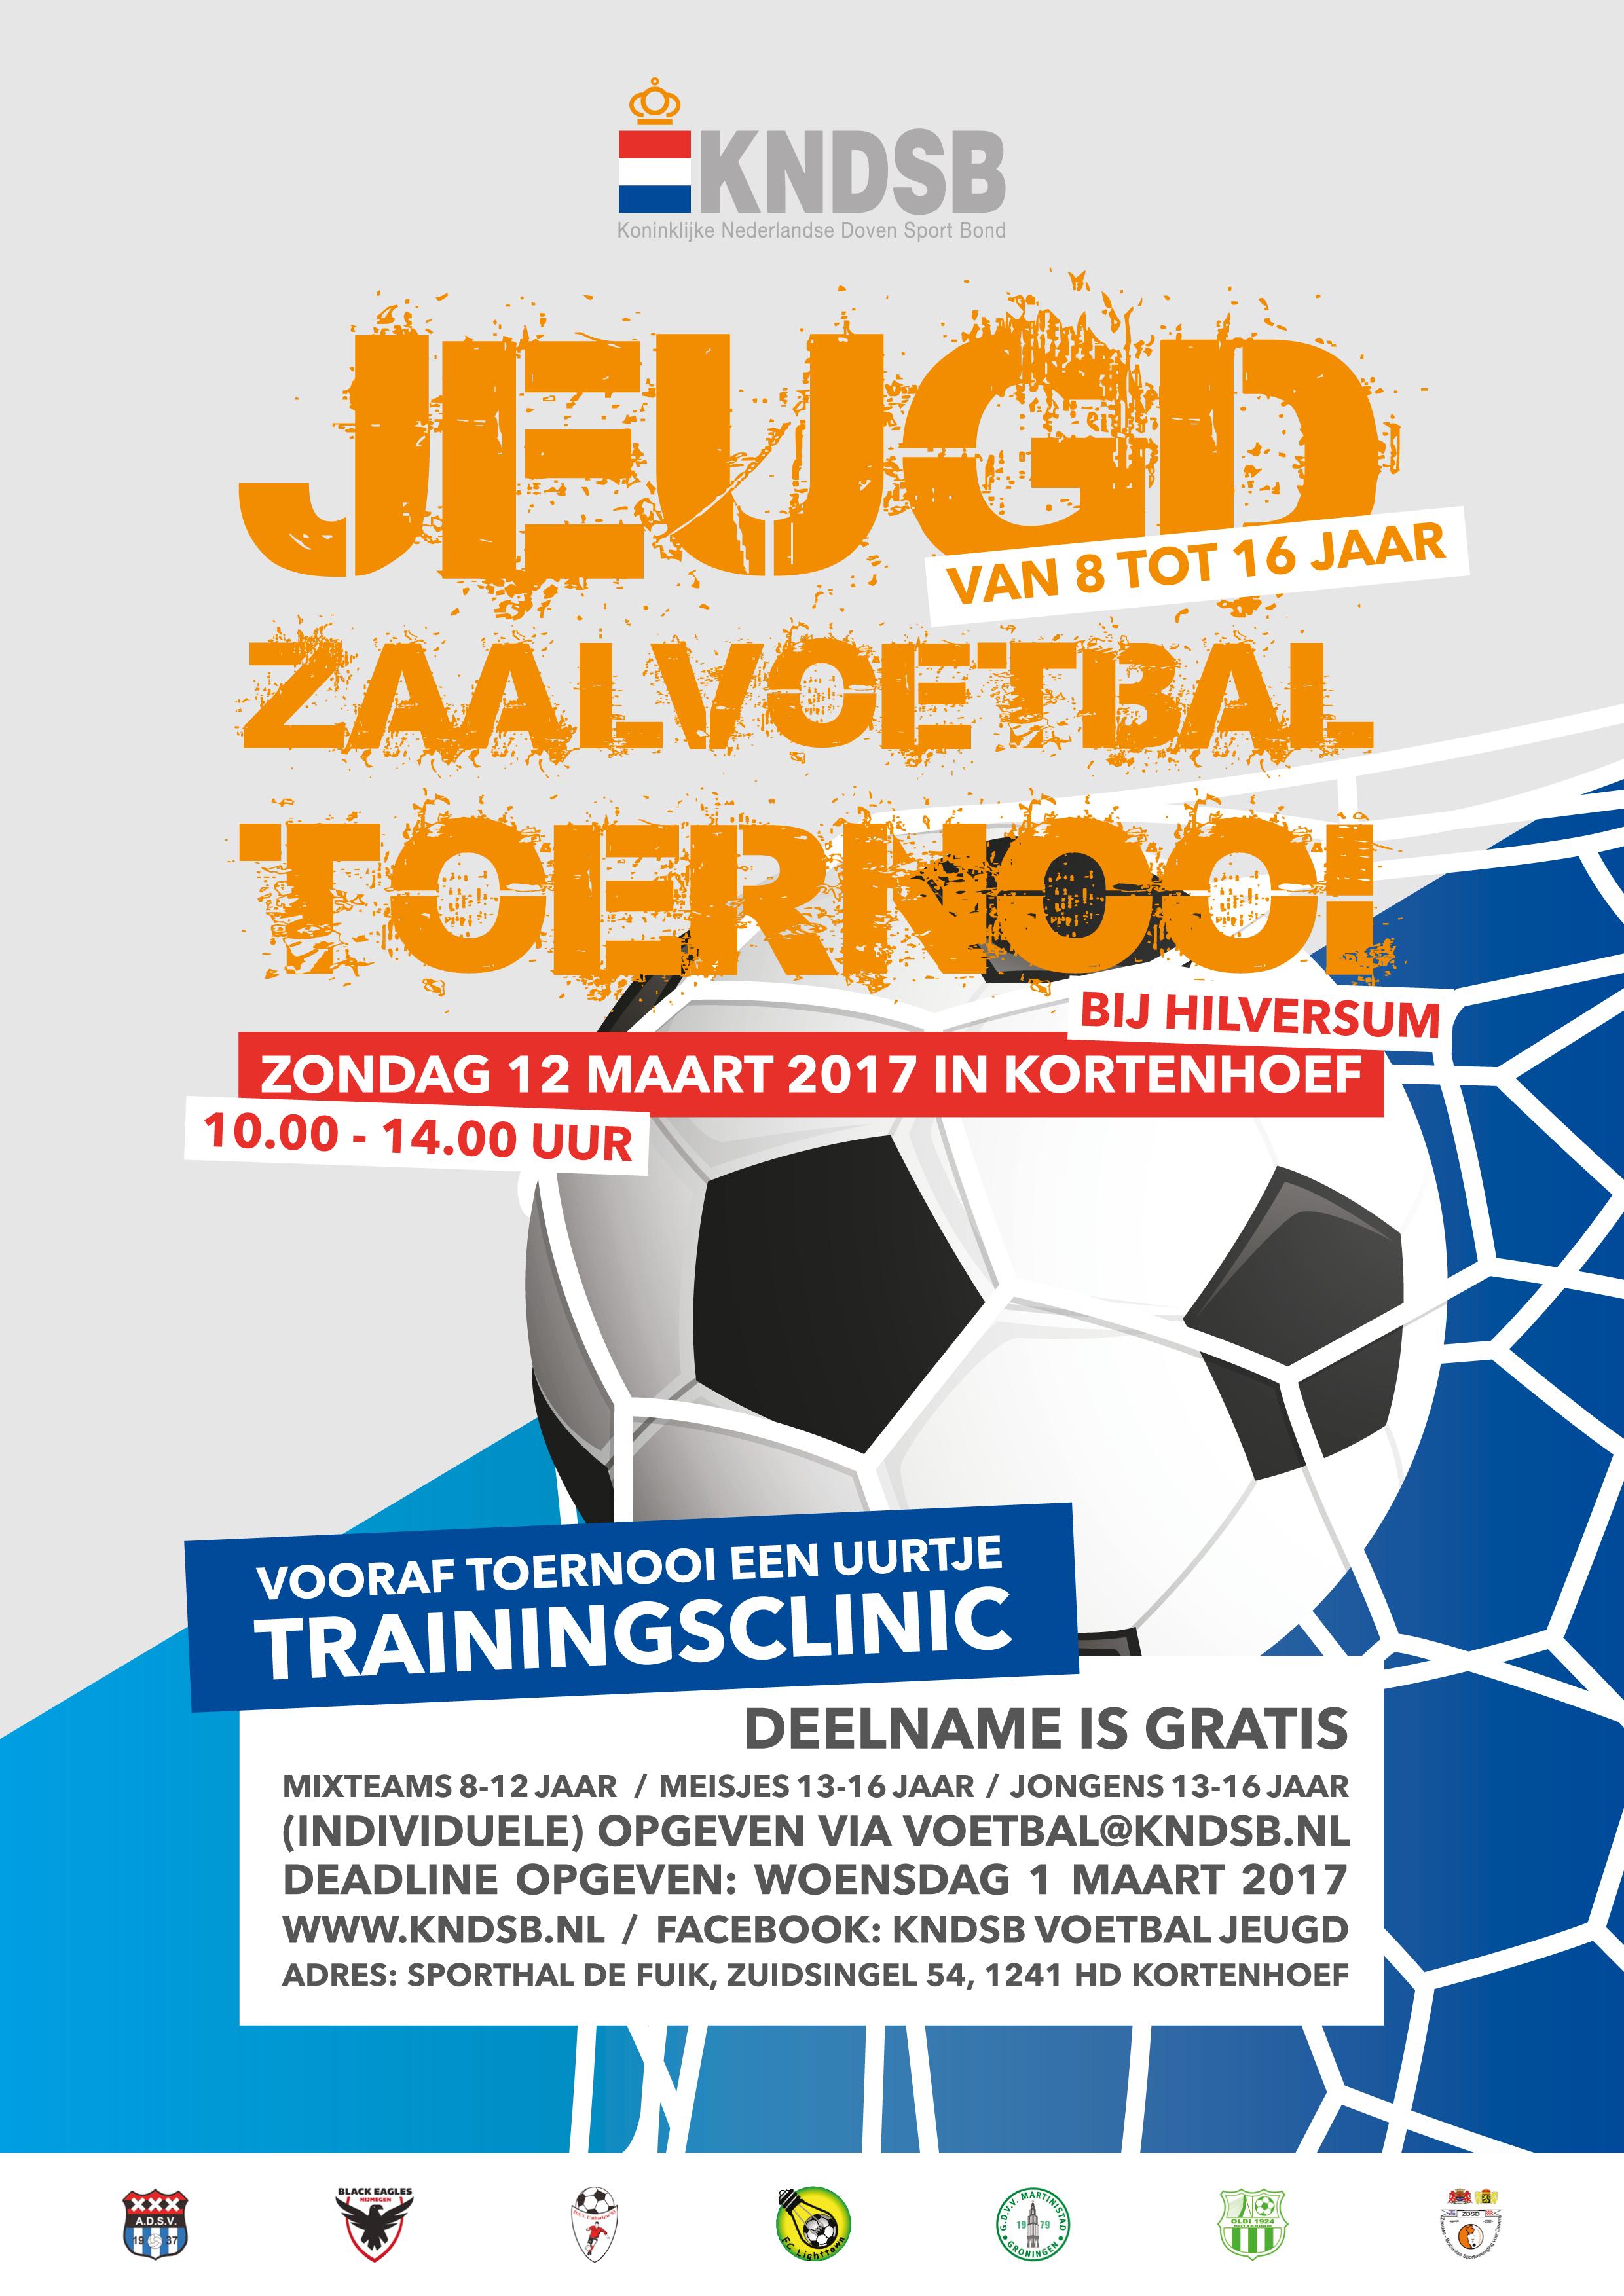 KNDSB_Jeugdzaal-voetbaltoernooi